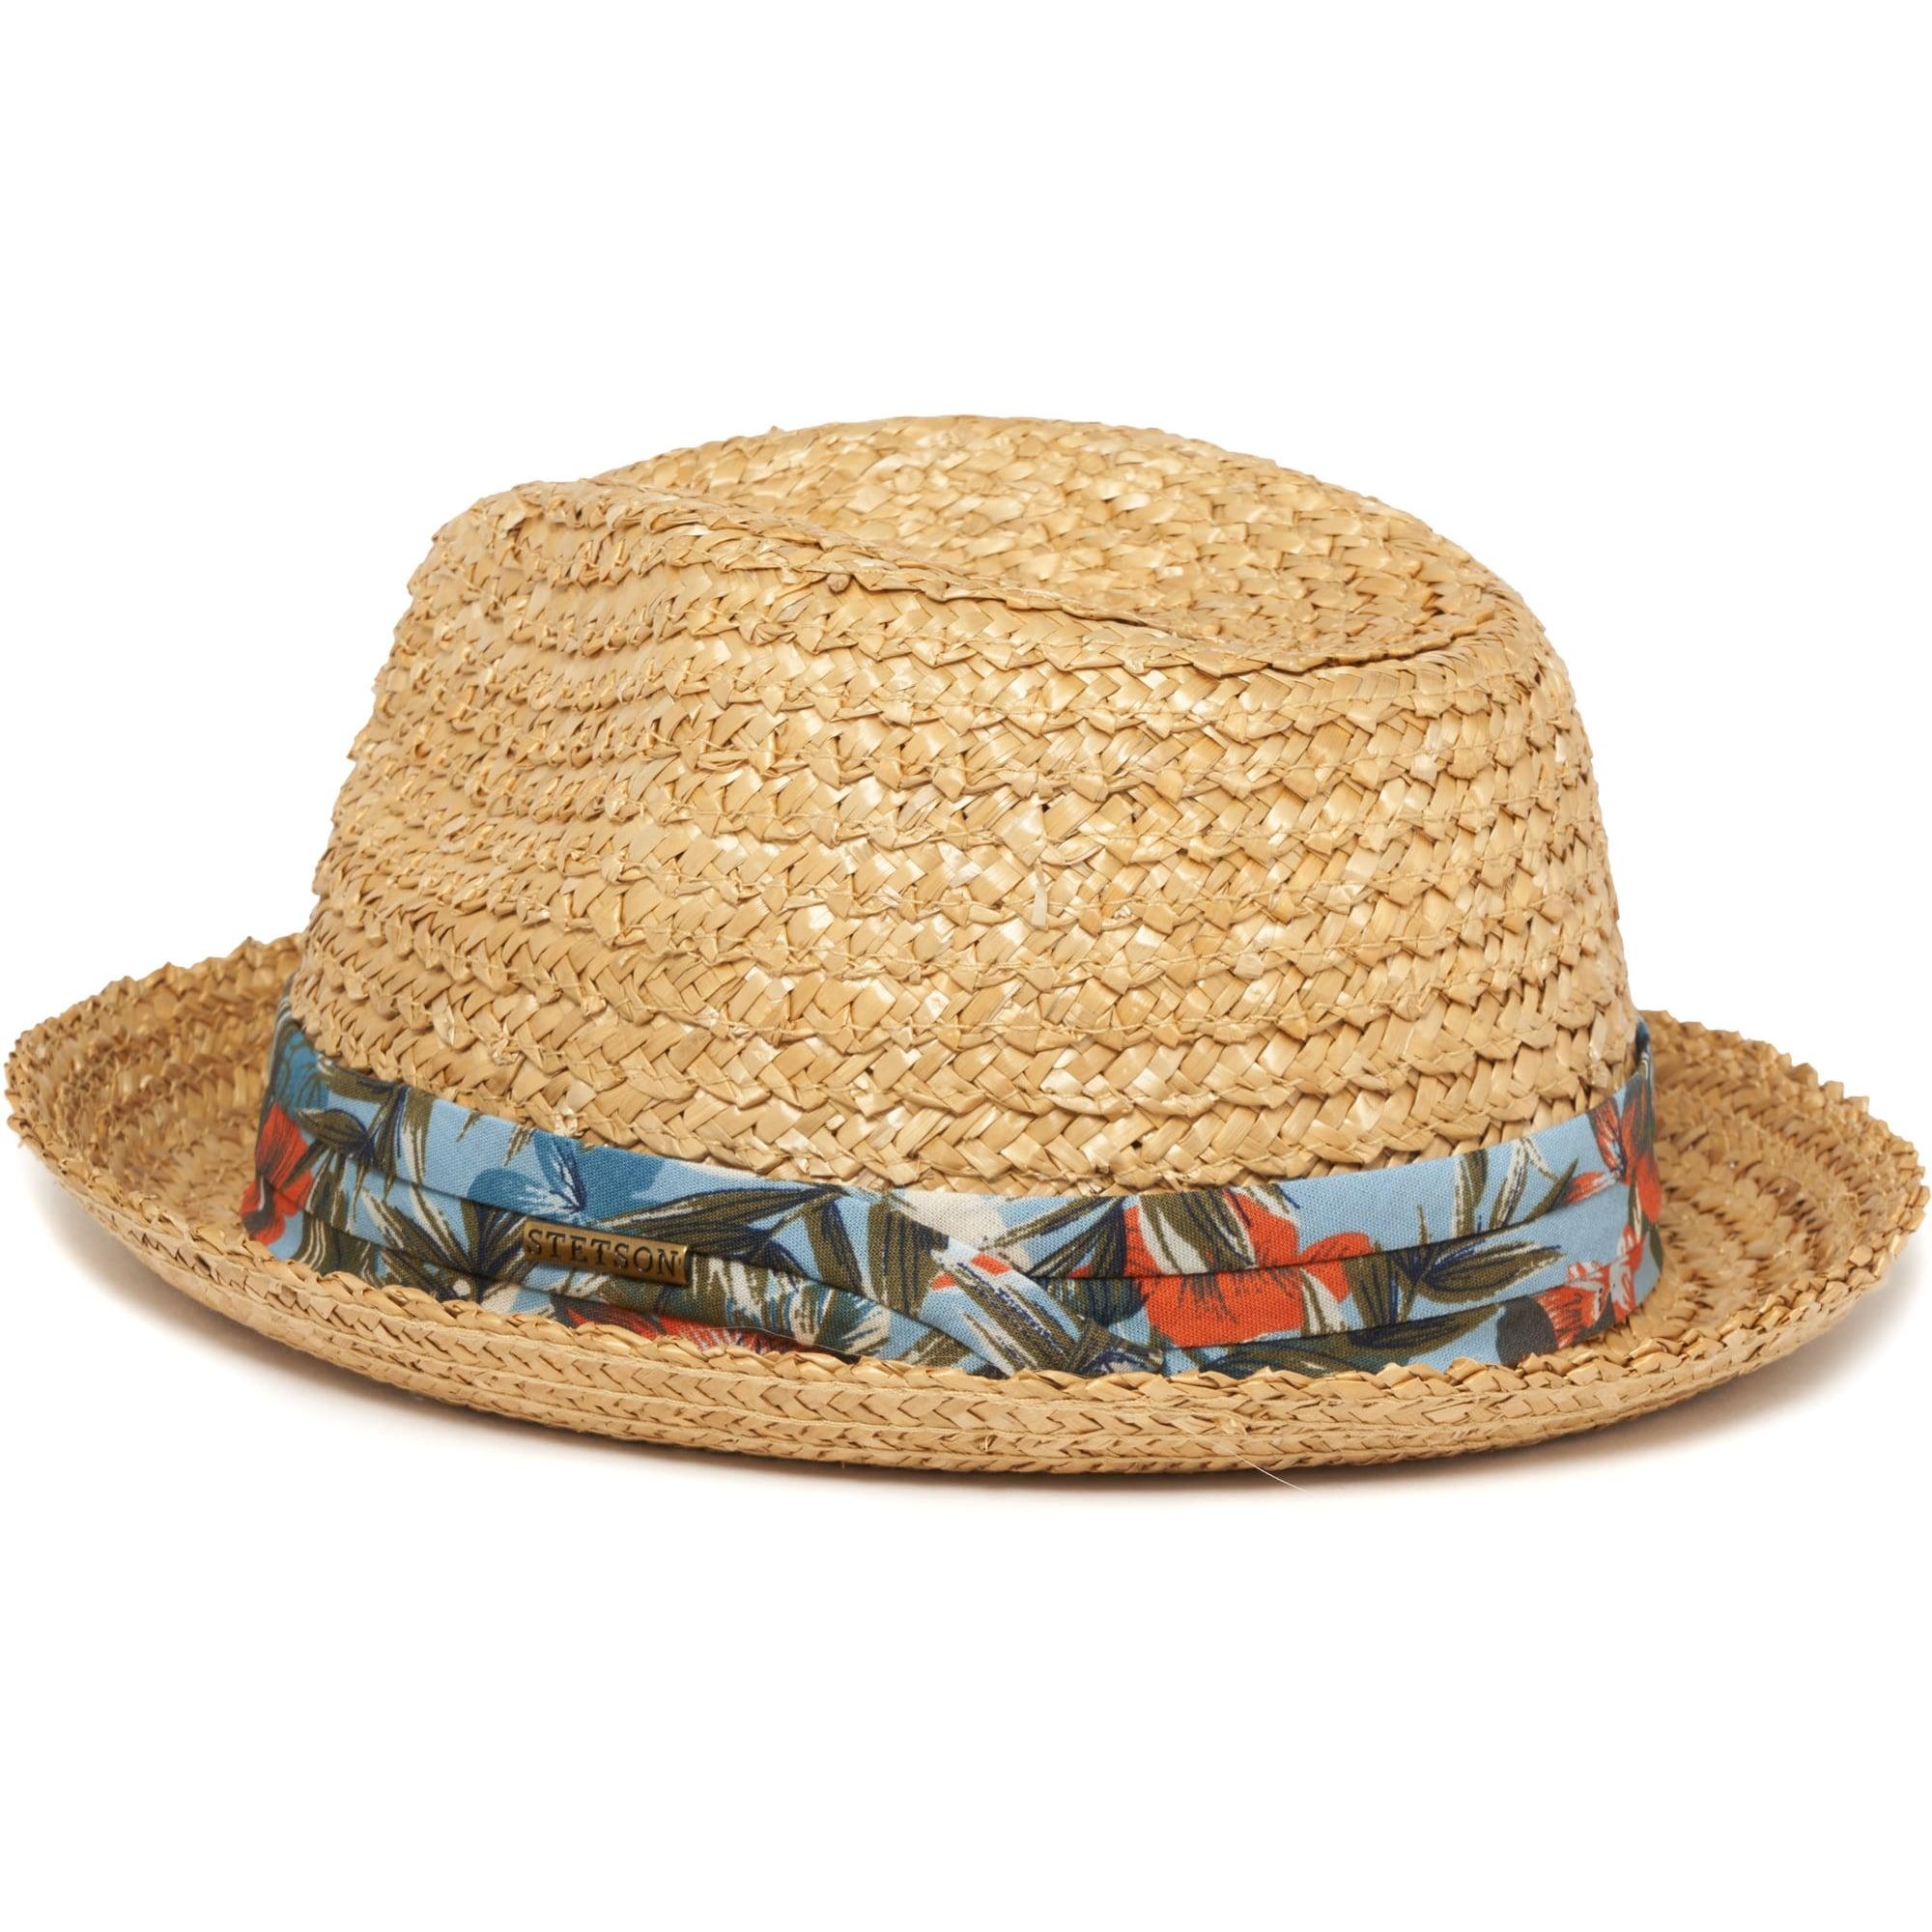 465816d53d1 Stetson Wheat Player Vintage Straw Fedora Hat   Dandy Fellow